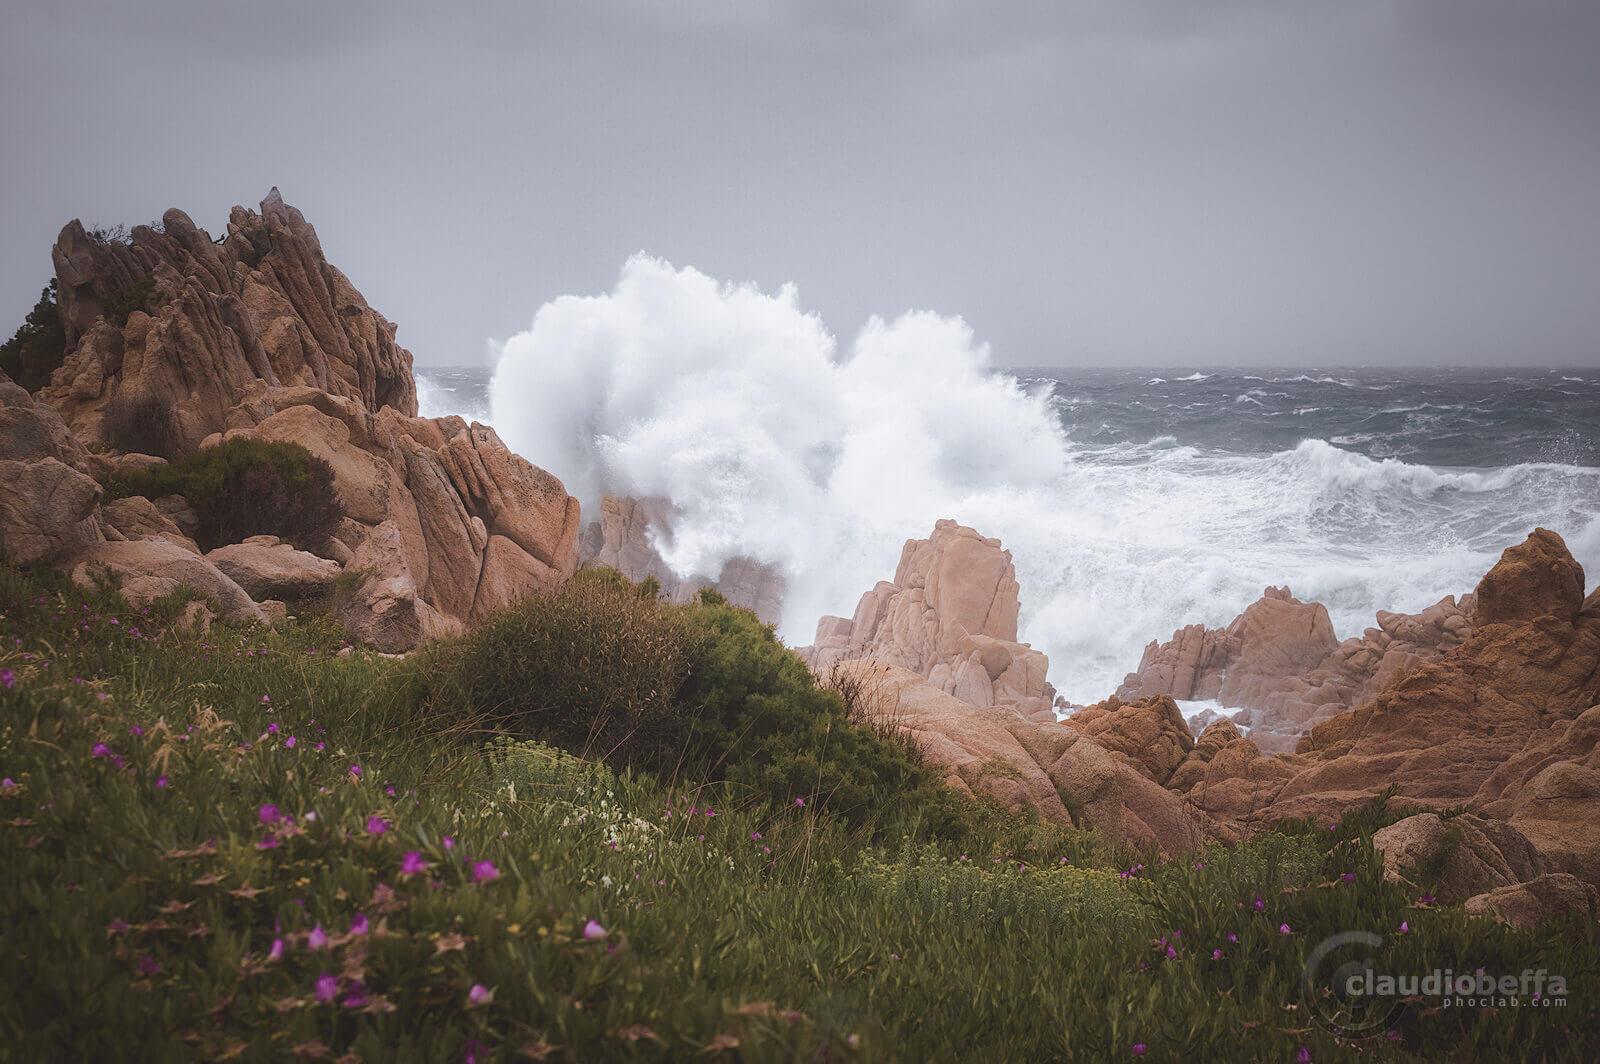 Sardinia, Sardegna, Italy, Sea, Storm, Waves, Rocks, Nature, Landscape, Seascape, Impact II